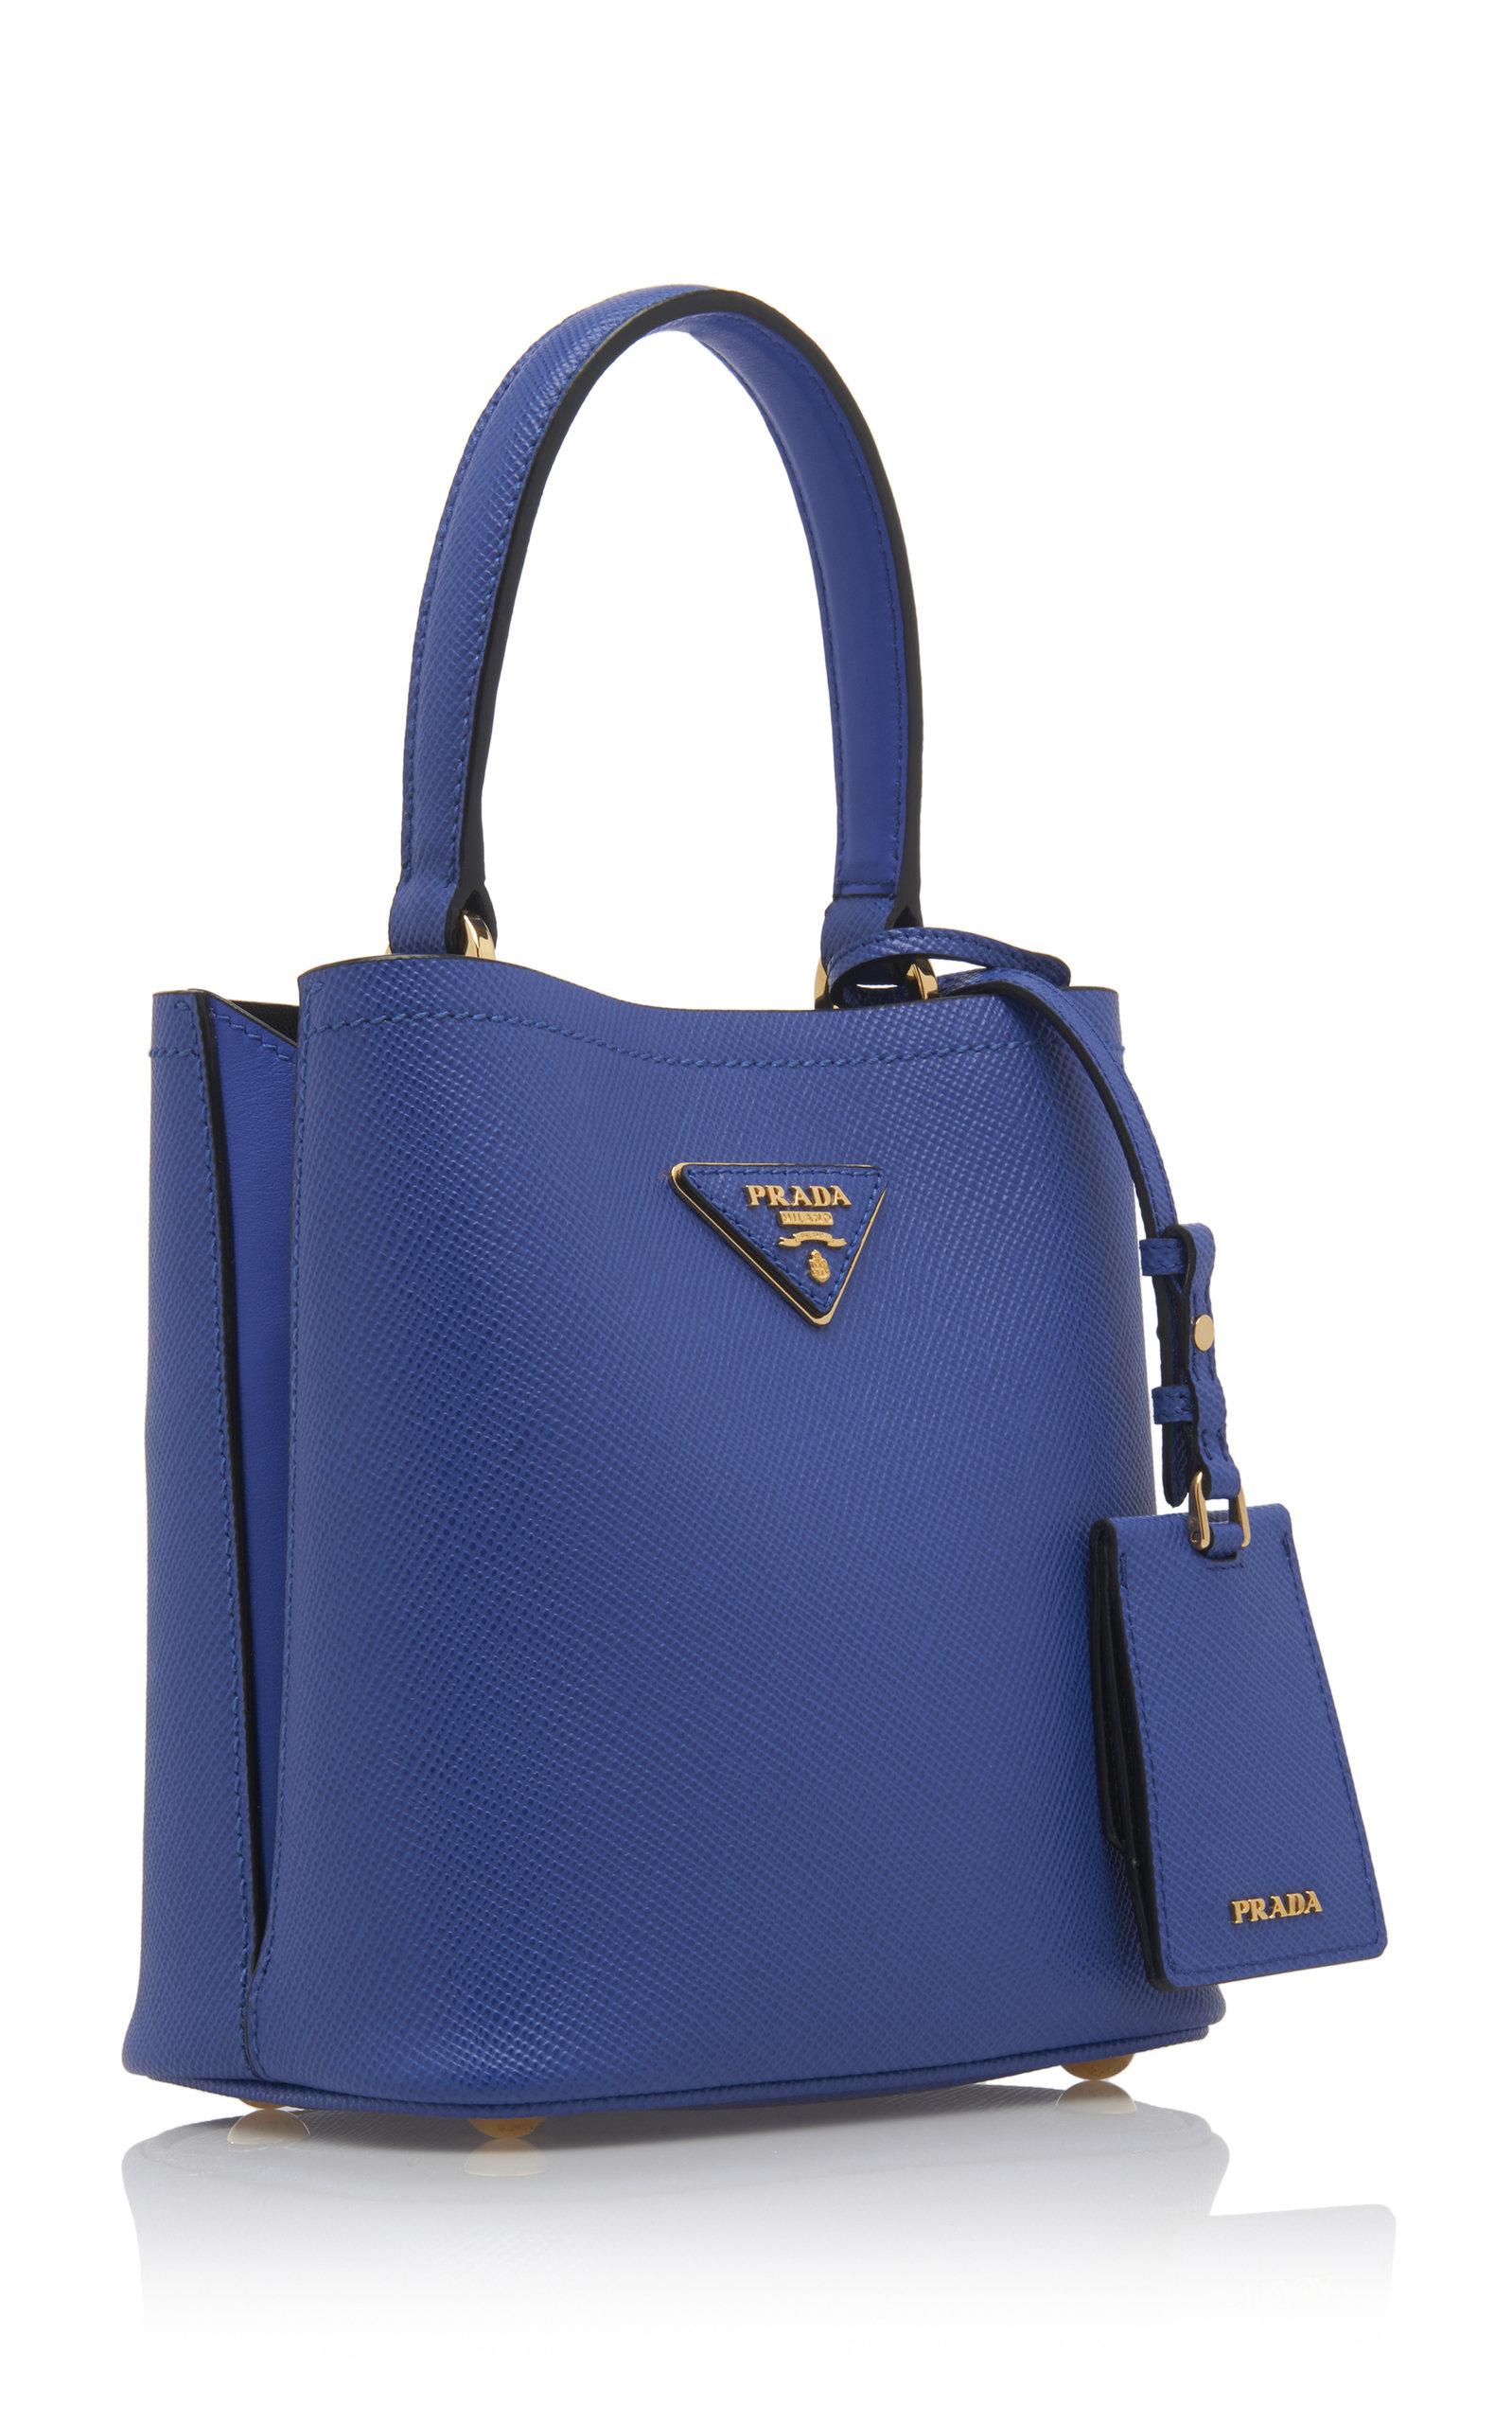 0d7d3db977bba9 PradaSmall Saffiano Leather Double Bucket Bag. CLOSE. Loading. Loading.  Loading